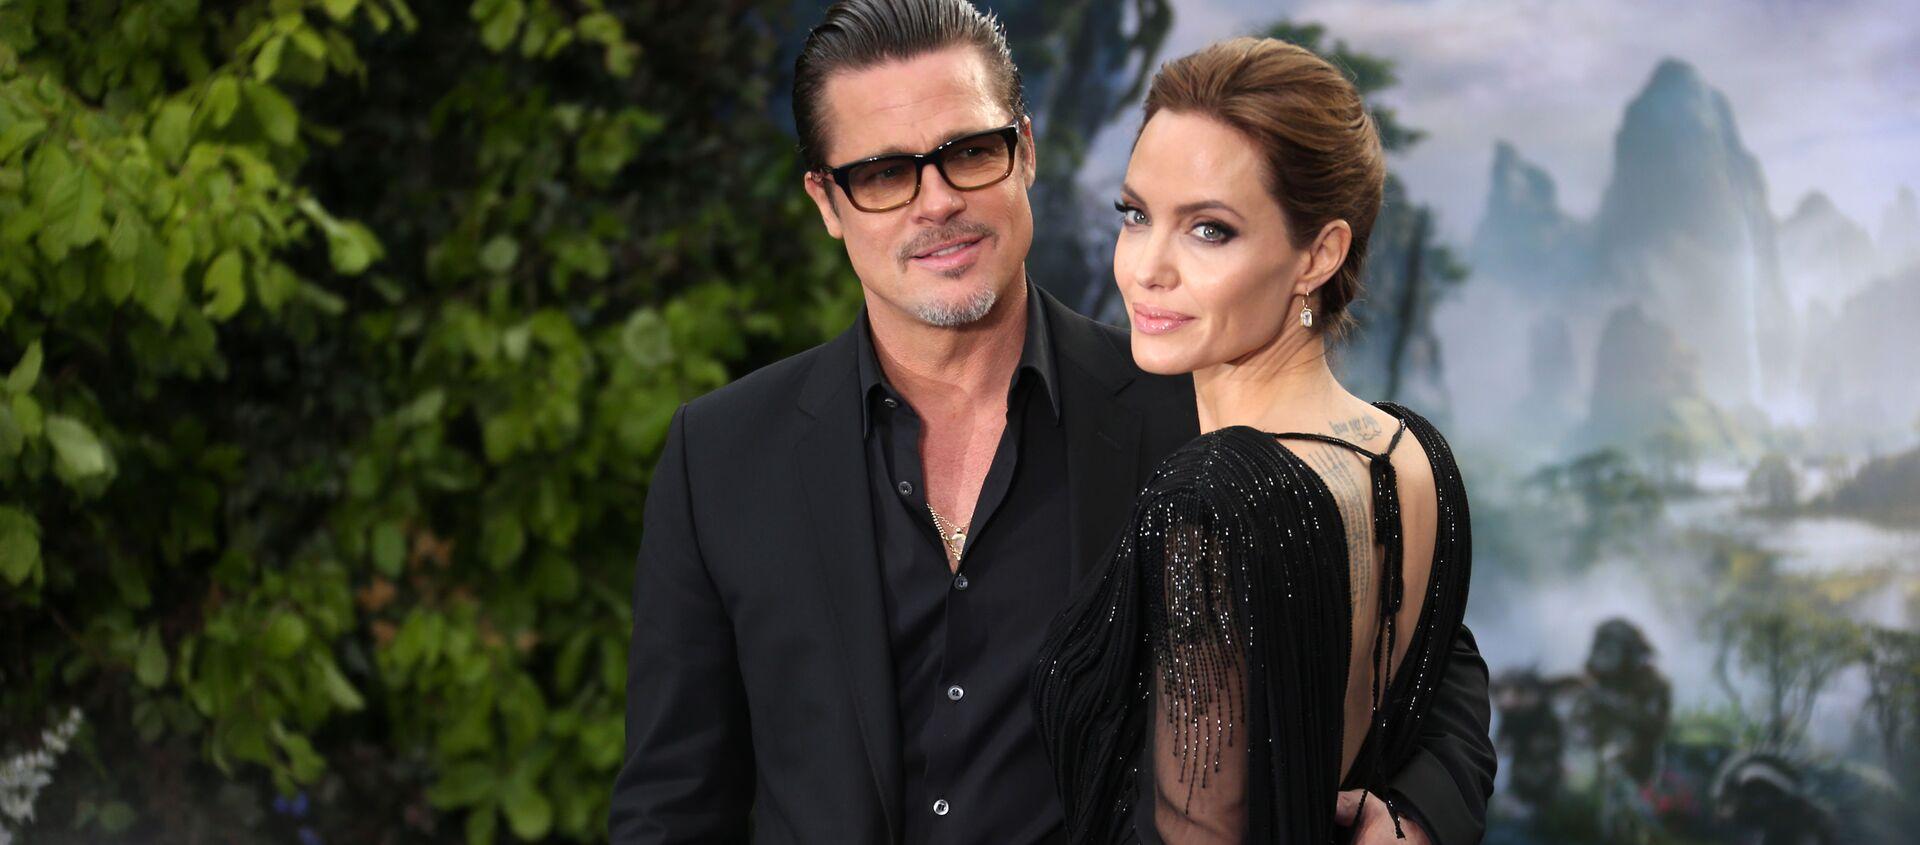 Brad Pitt i Angelina Jolie w 2014 roku - Sputnik Polska, 1920, 21.06.2020